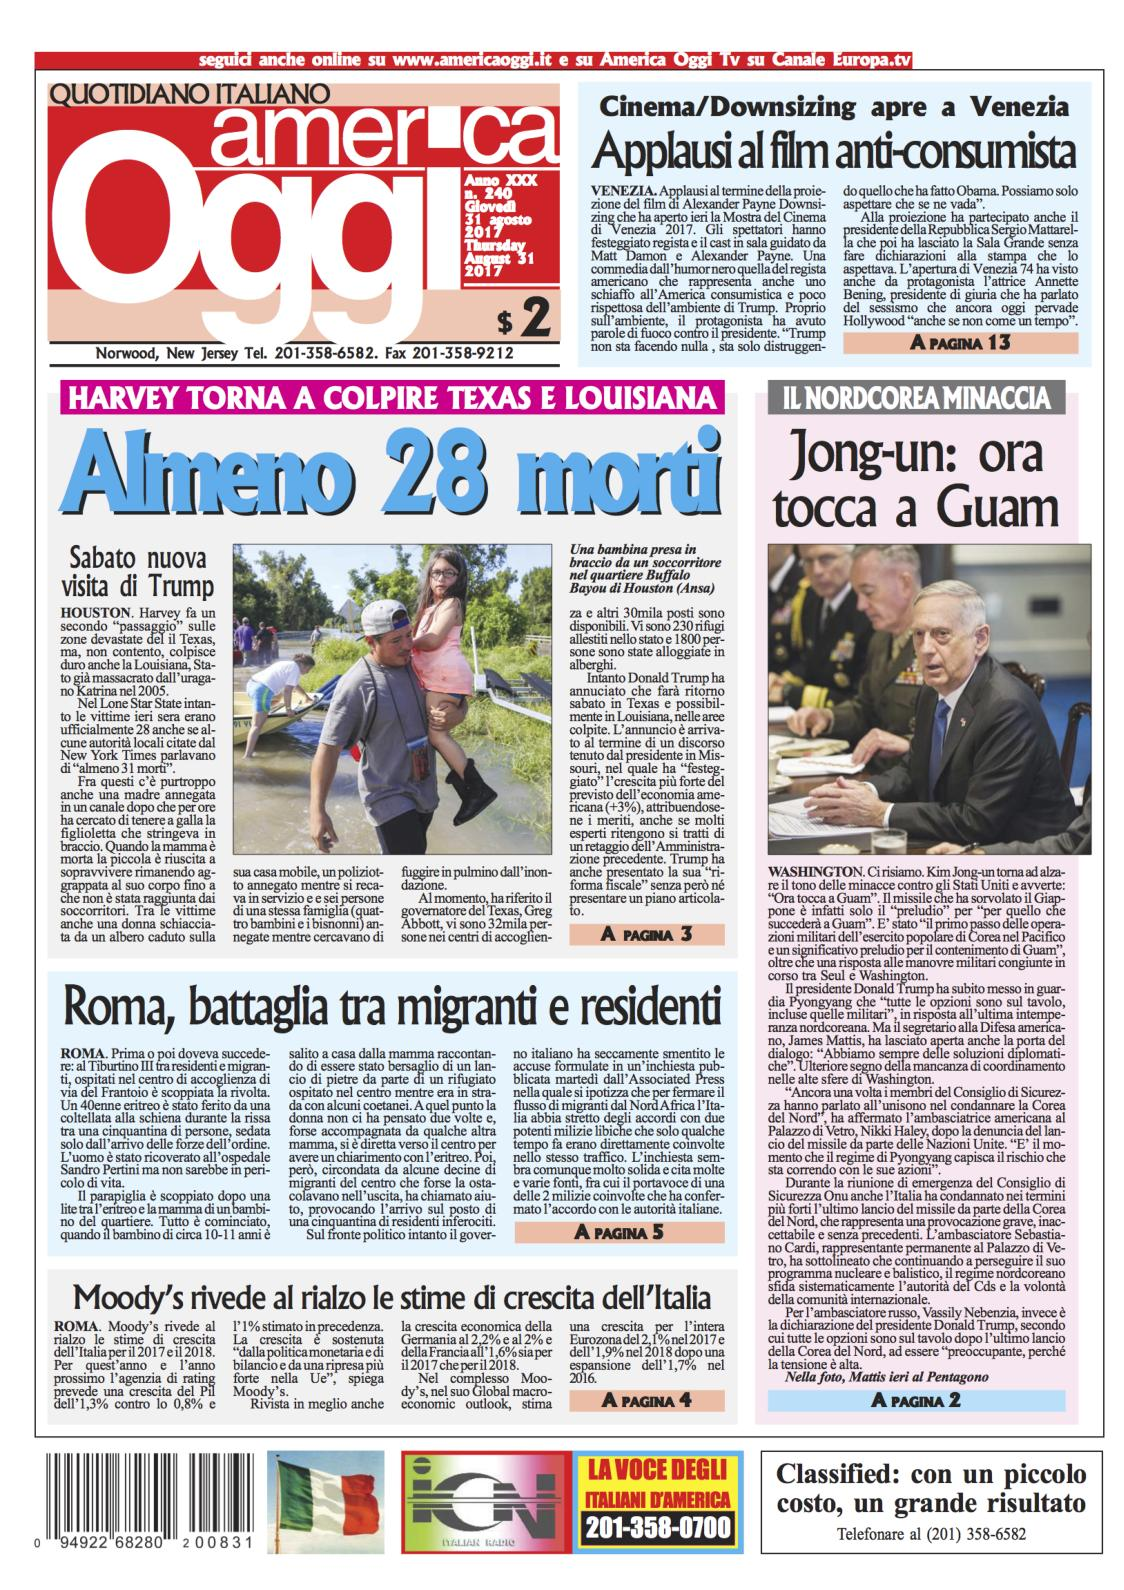 Calaméo - America Oggi 31 Agosto 2017 ffc00d284ab4